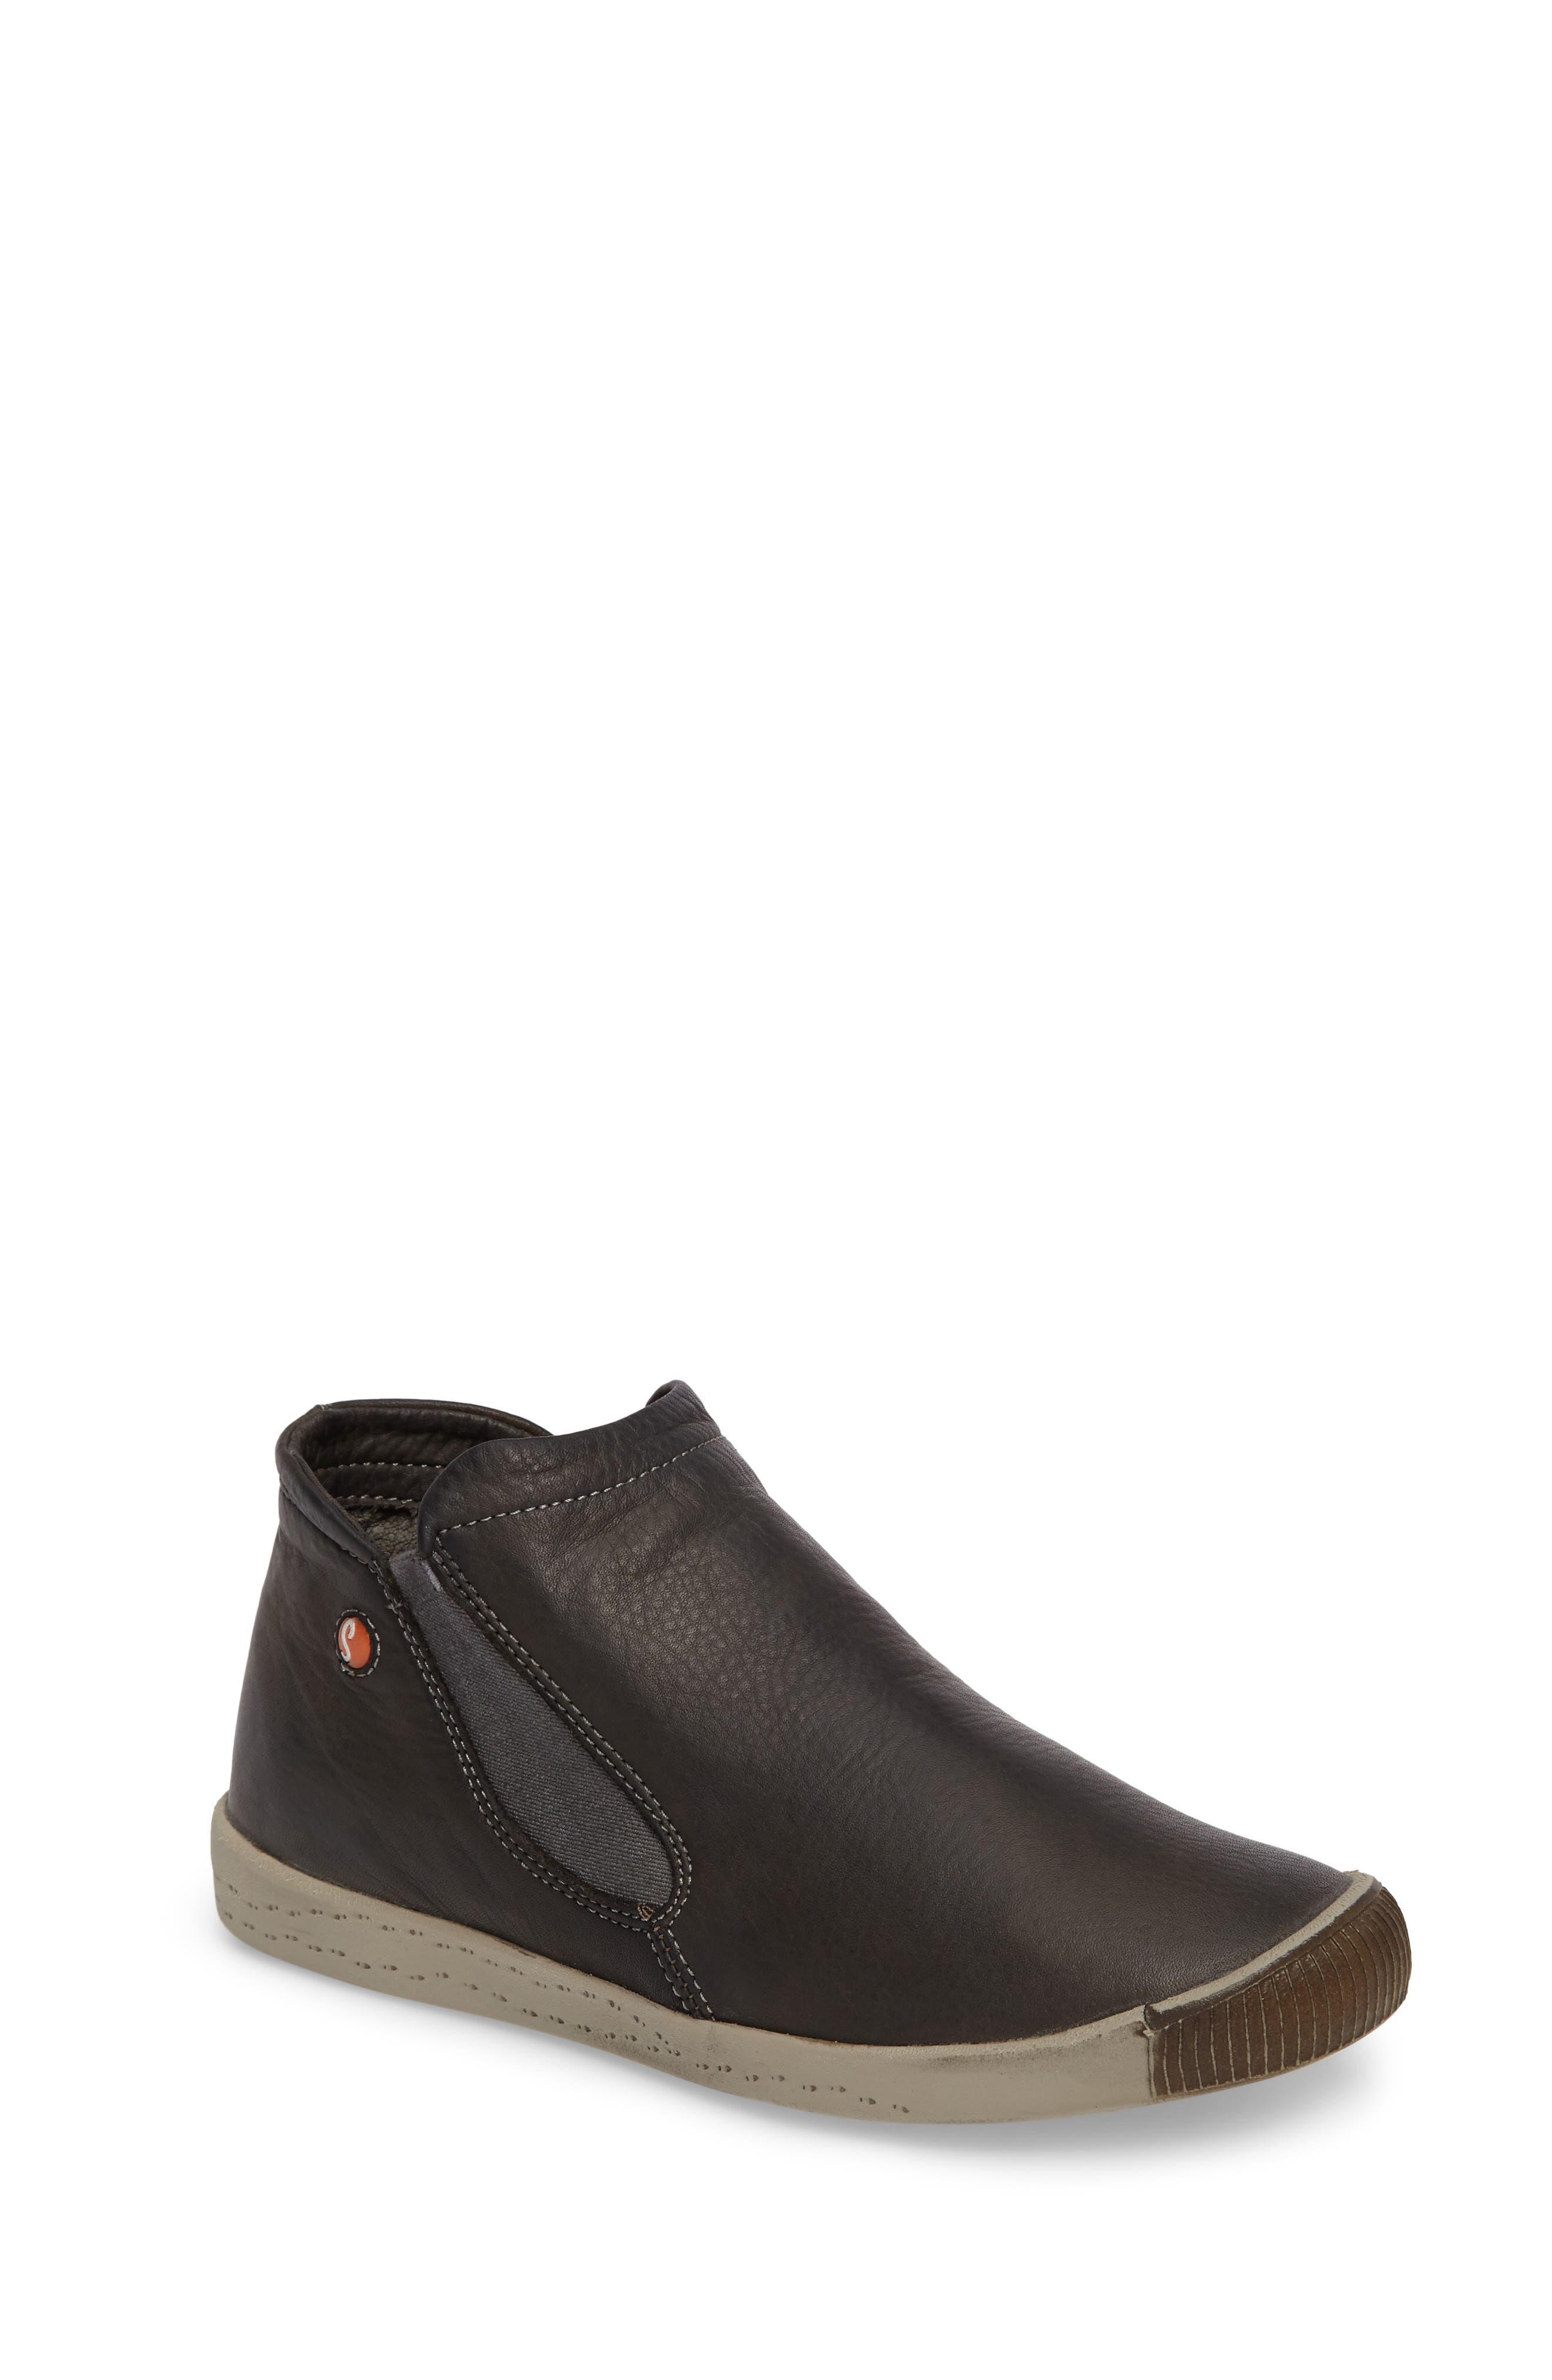 Inge Slip-On Sneaker,                             Main thumbnail 1, color,                             Military Leather